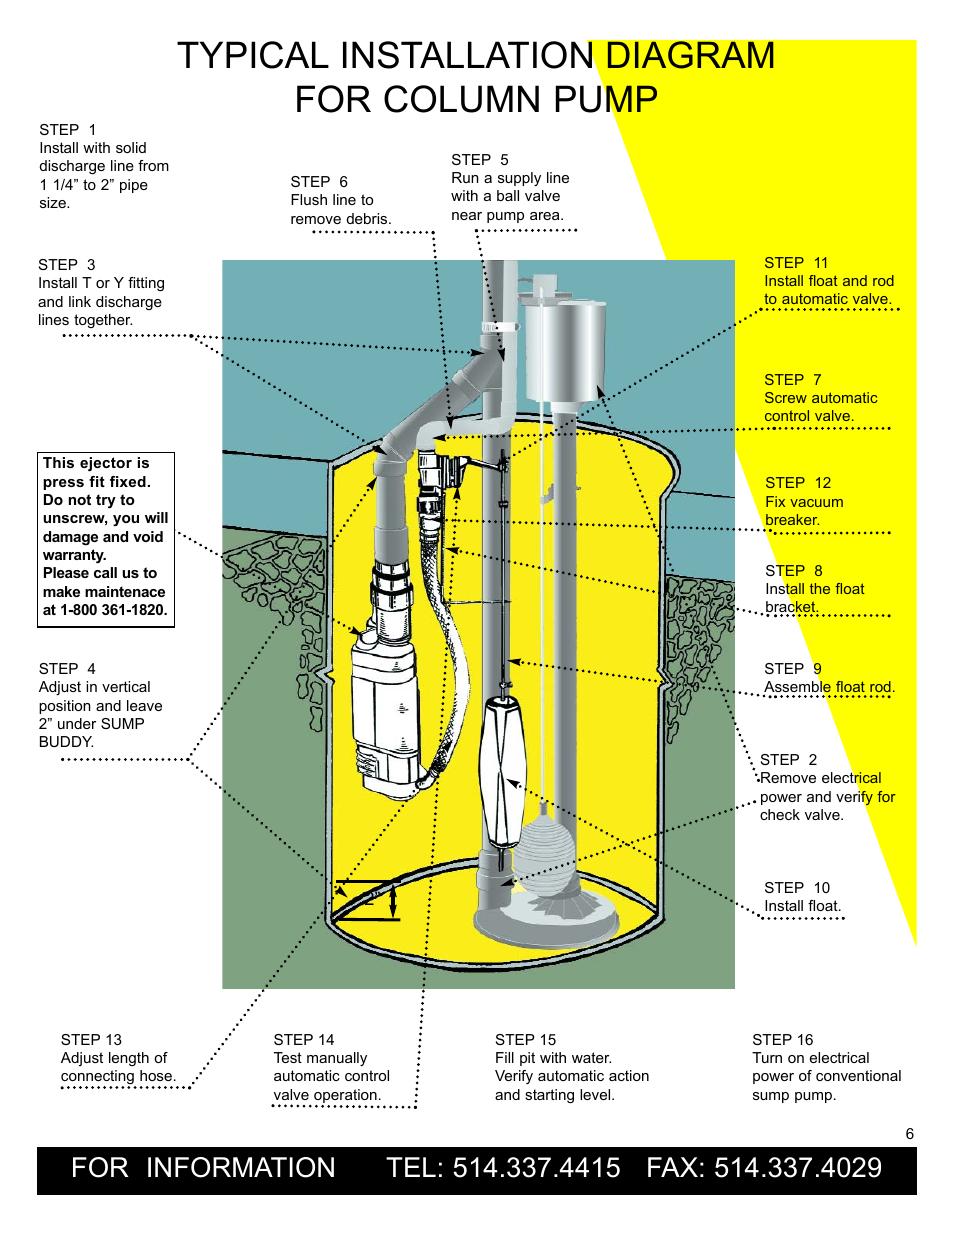 Typical Installation Diagram For Column Pump